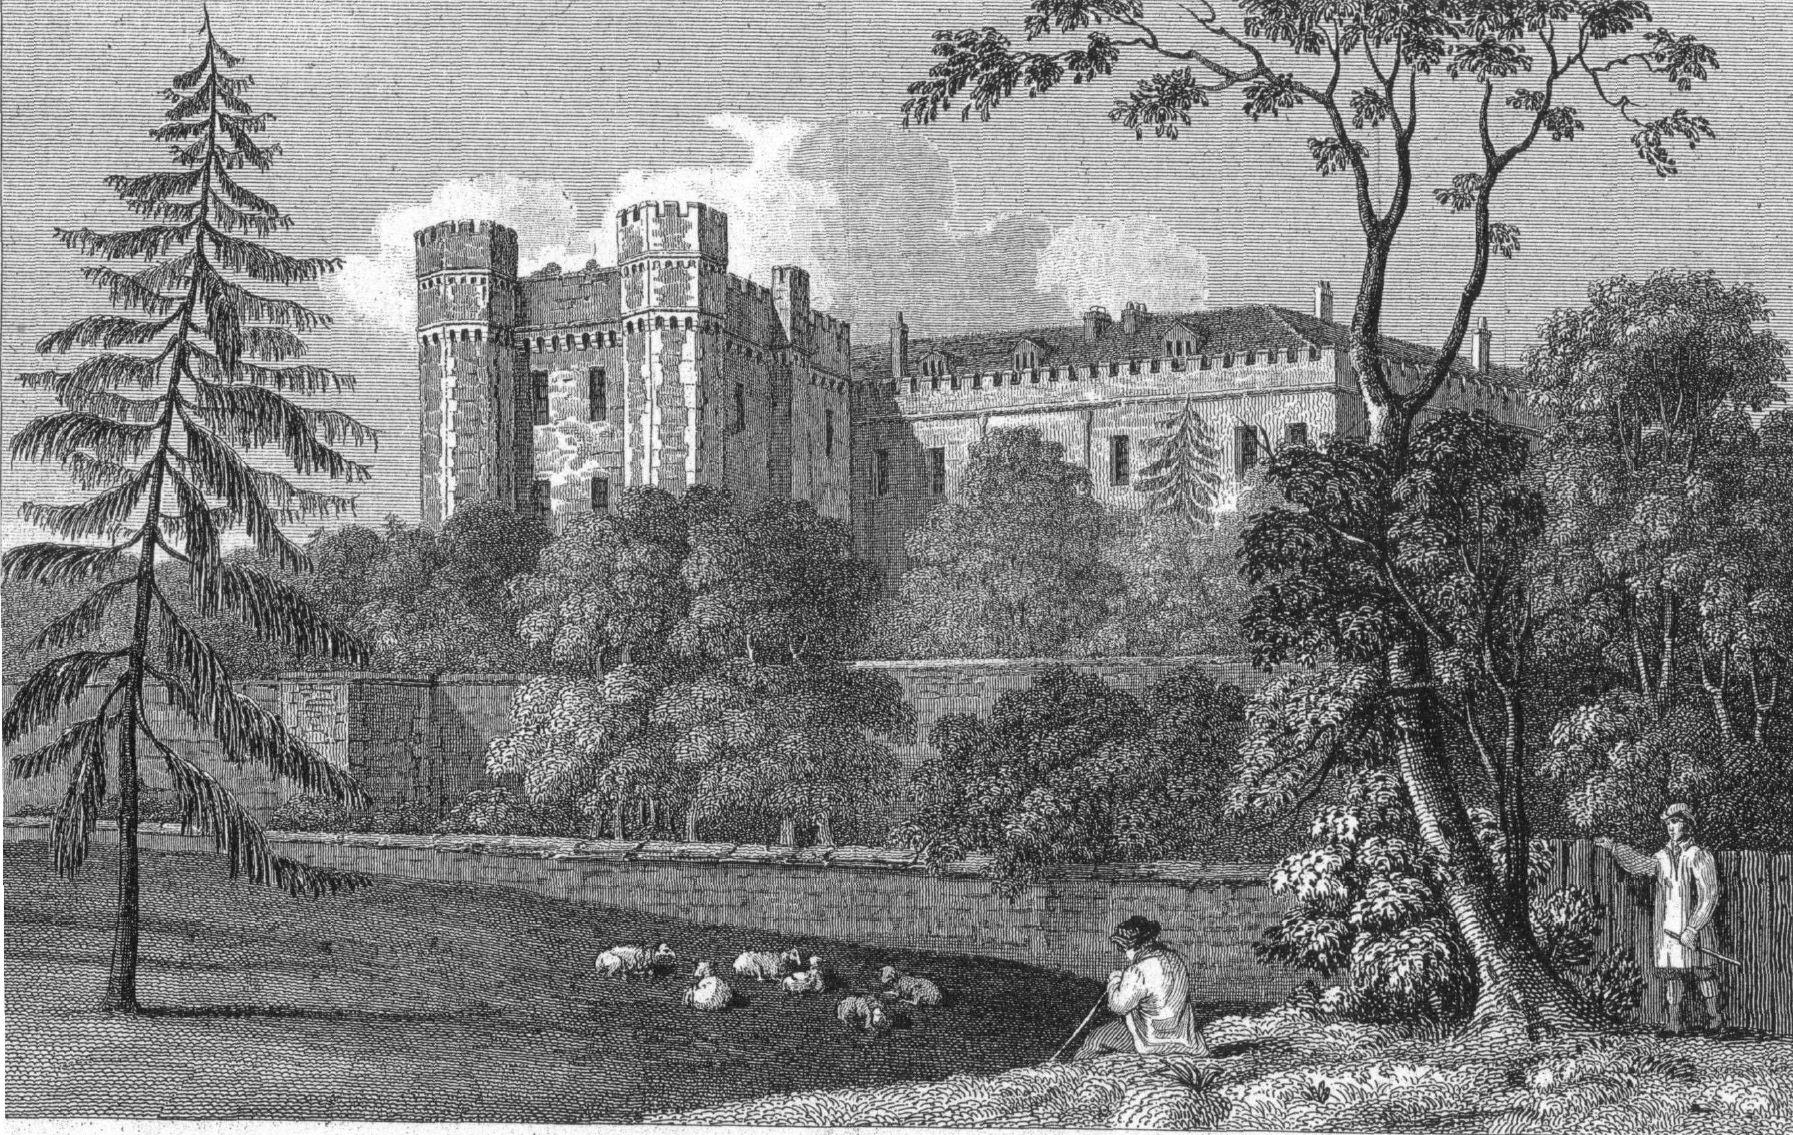 Farnham Castle south face terrace wall